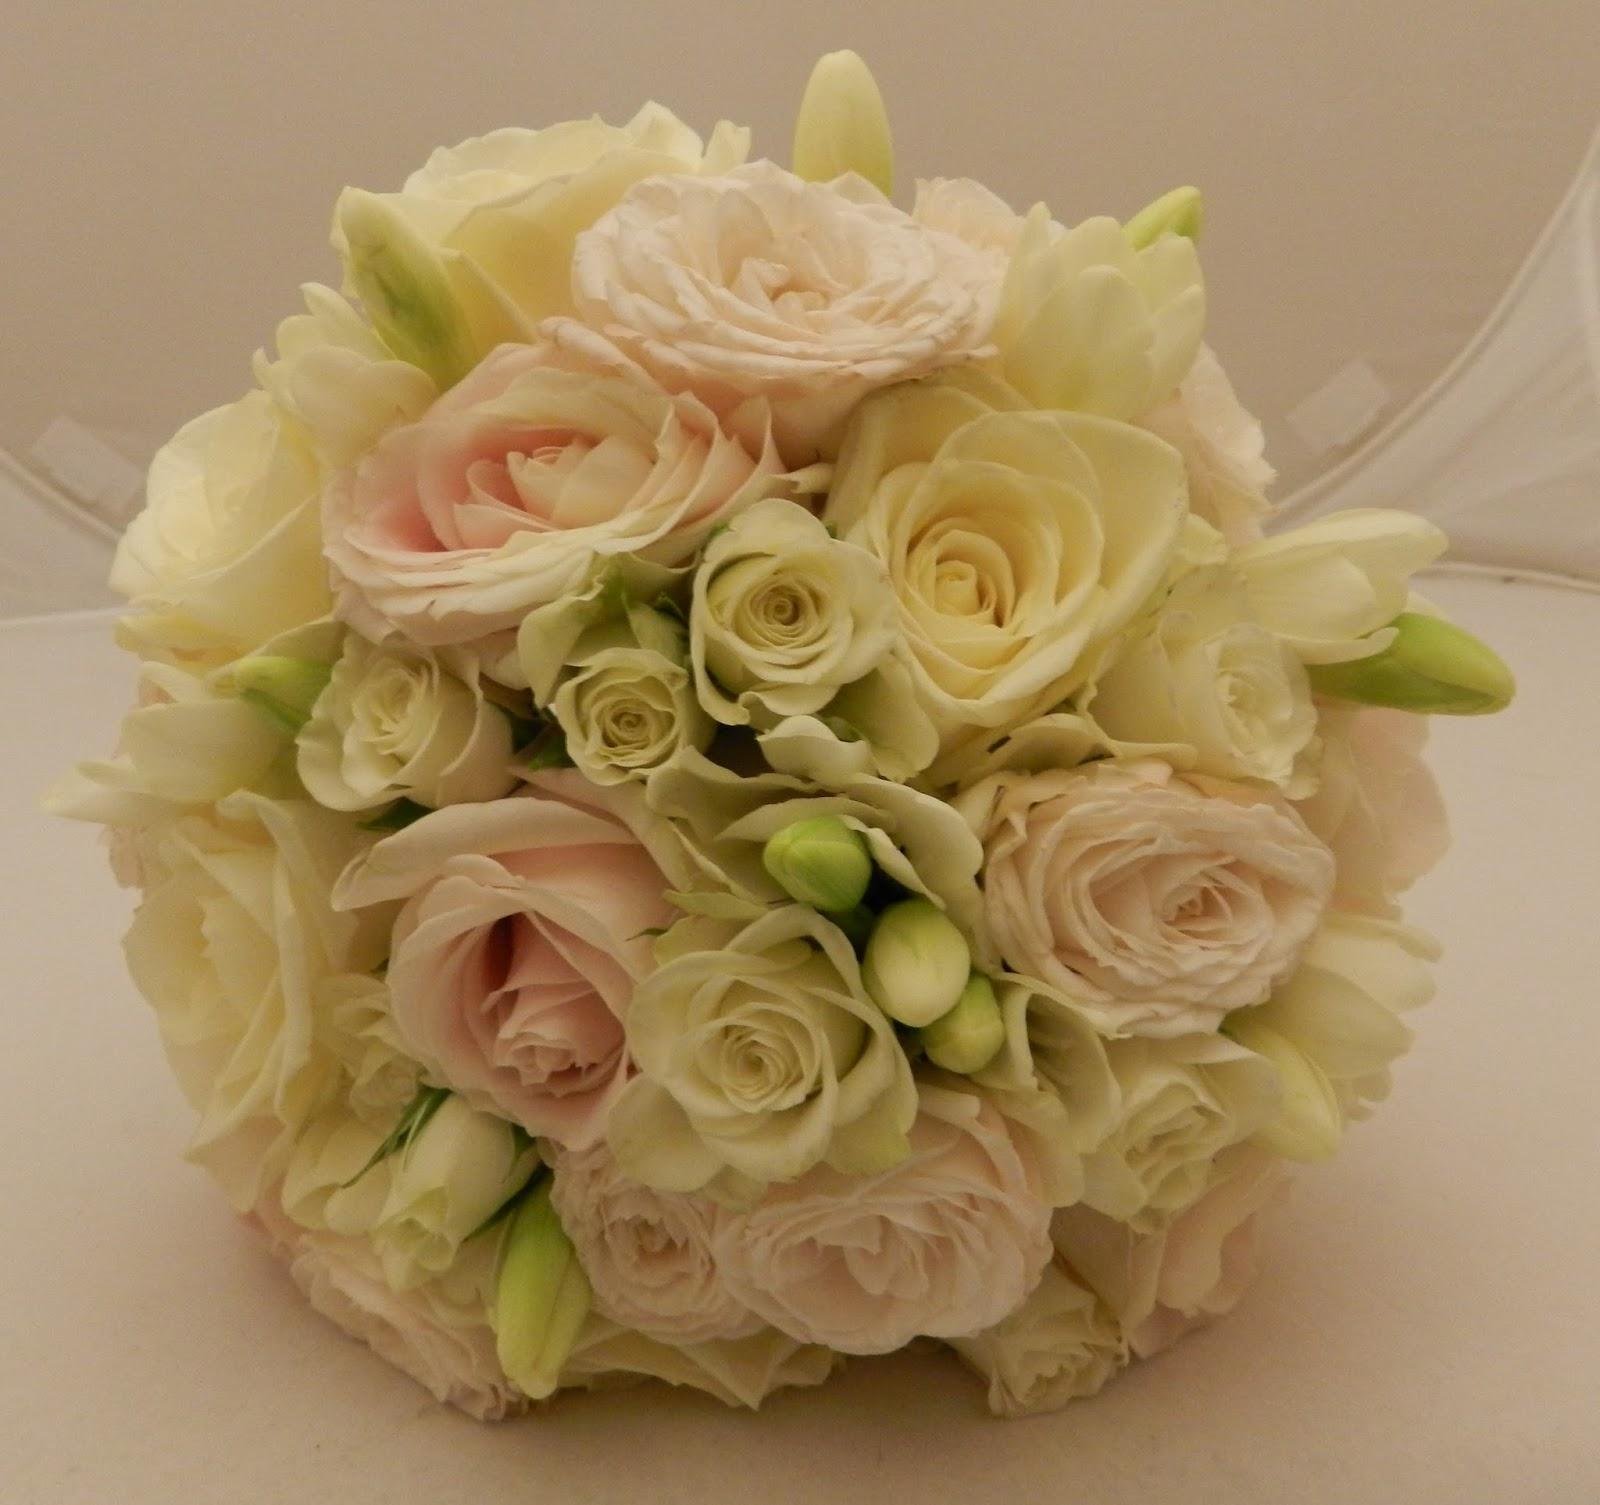 Sandras Flower Studio Blush And Ivory Wedding Flowers